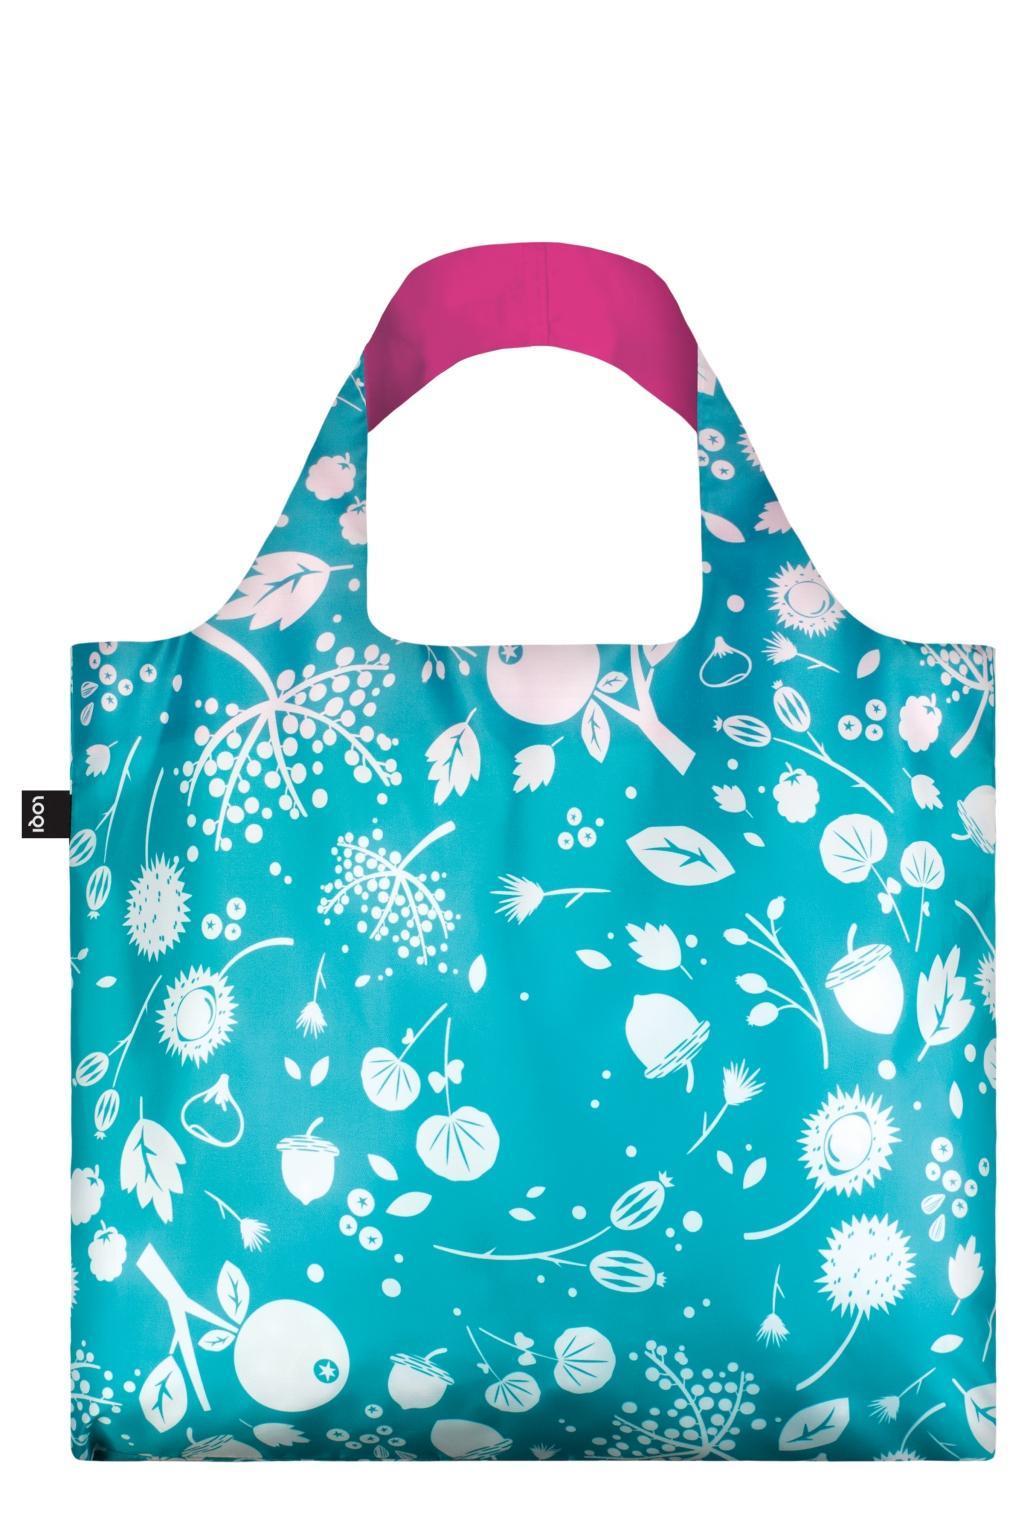 LOQI-Bag-SEED-Teal